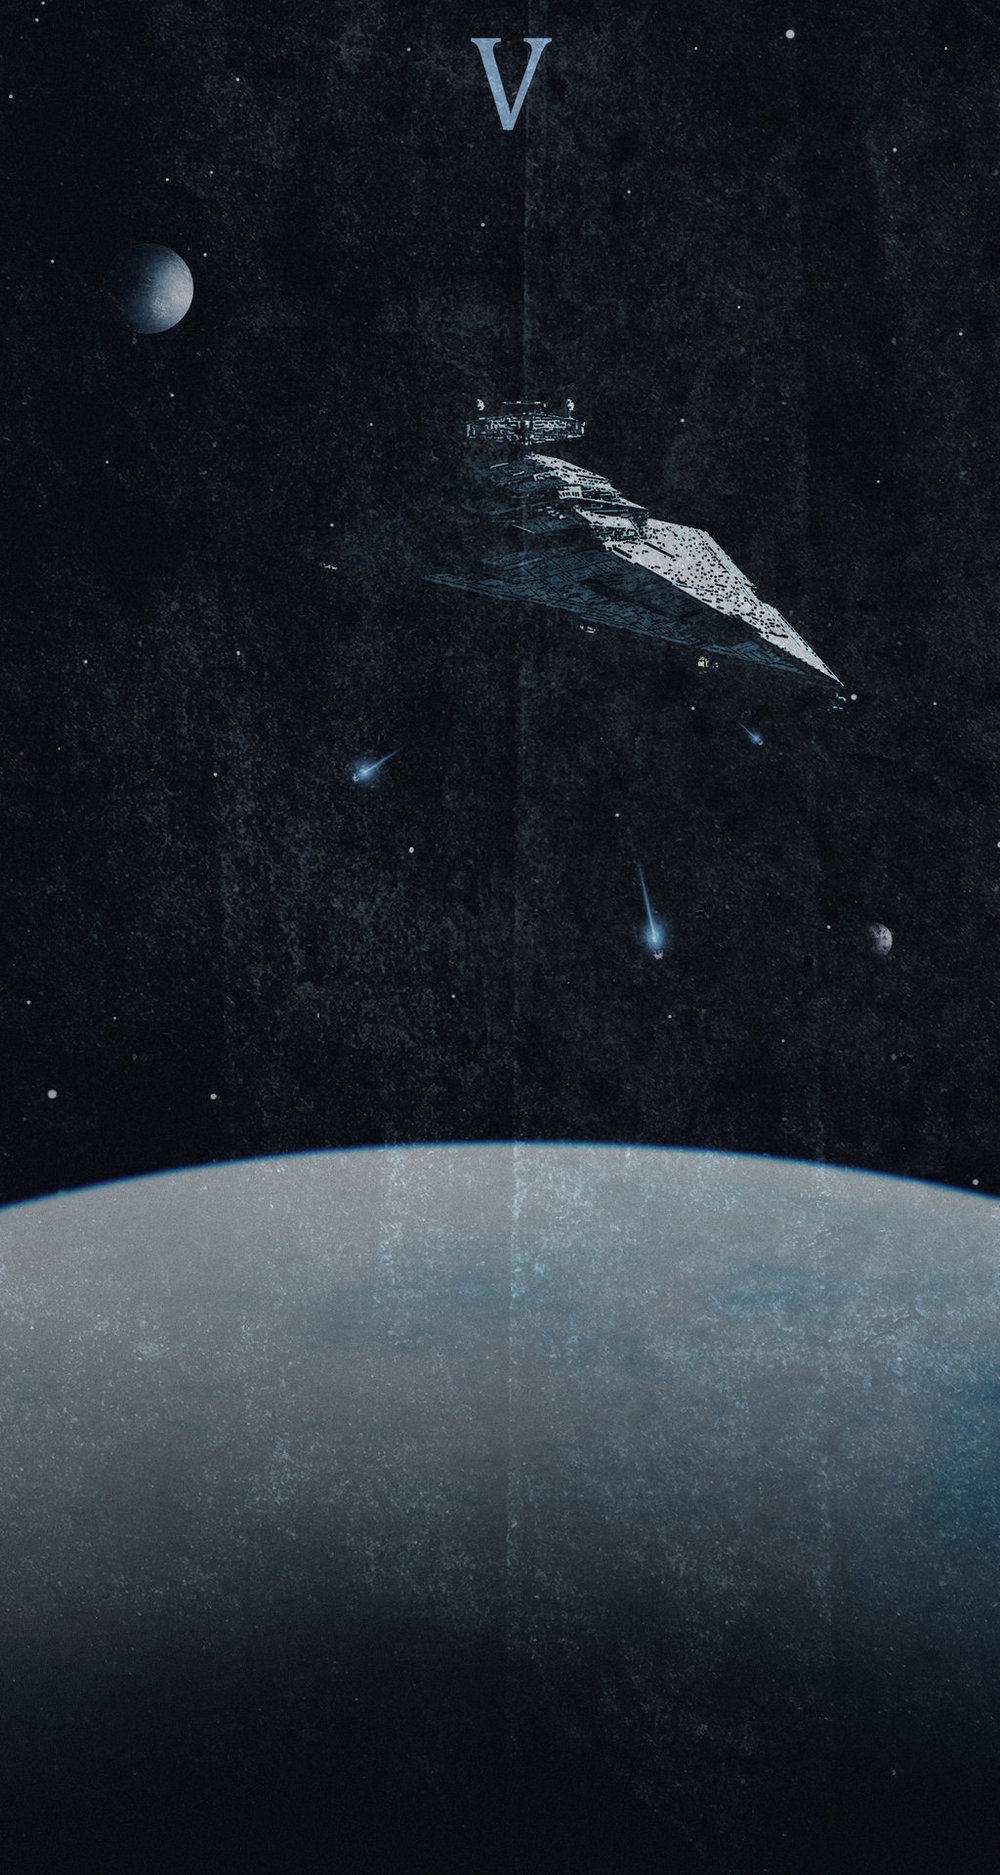 empire_strikes_back_by_scourge07-d7m0ov4.jpg